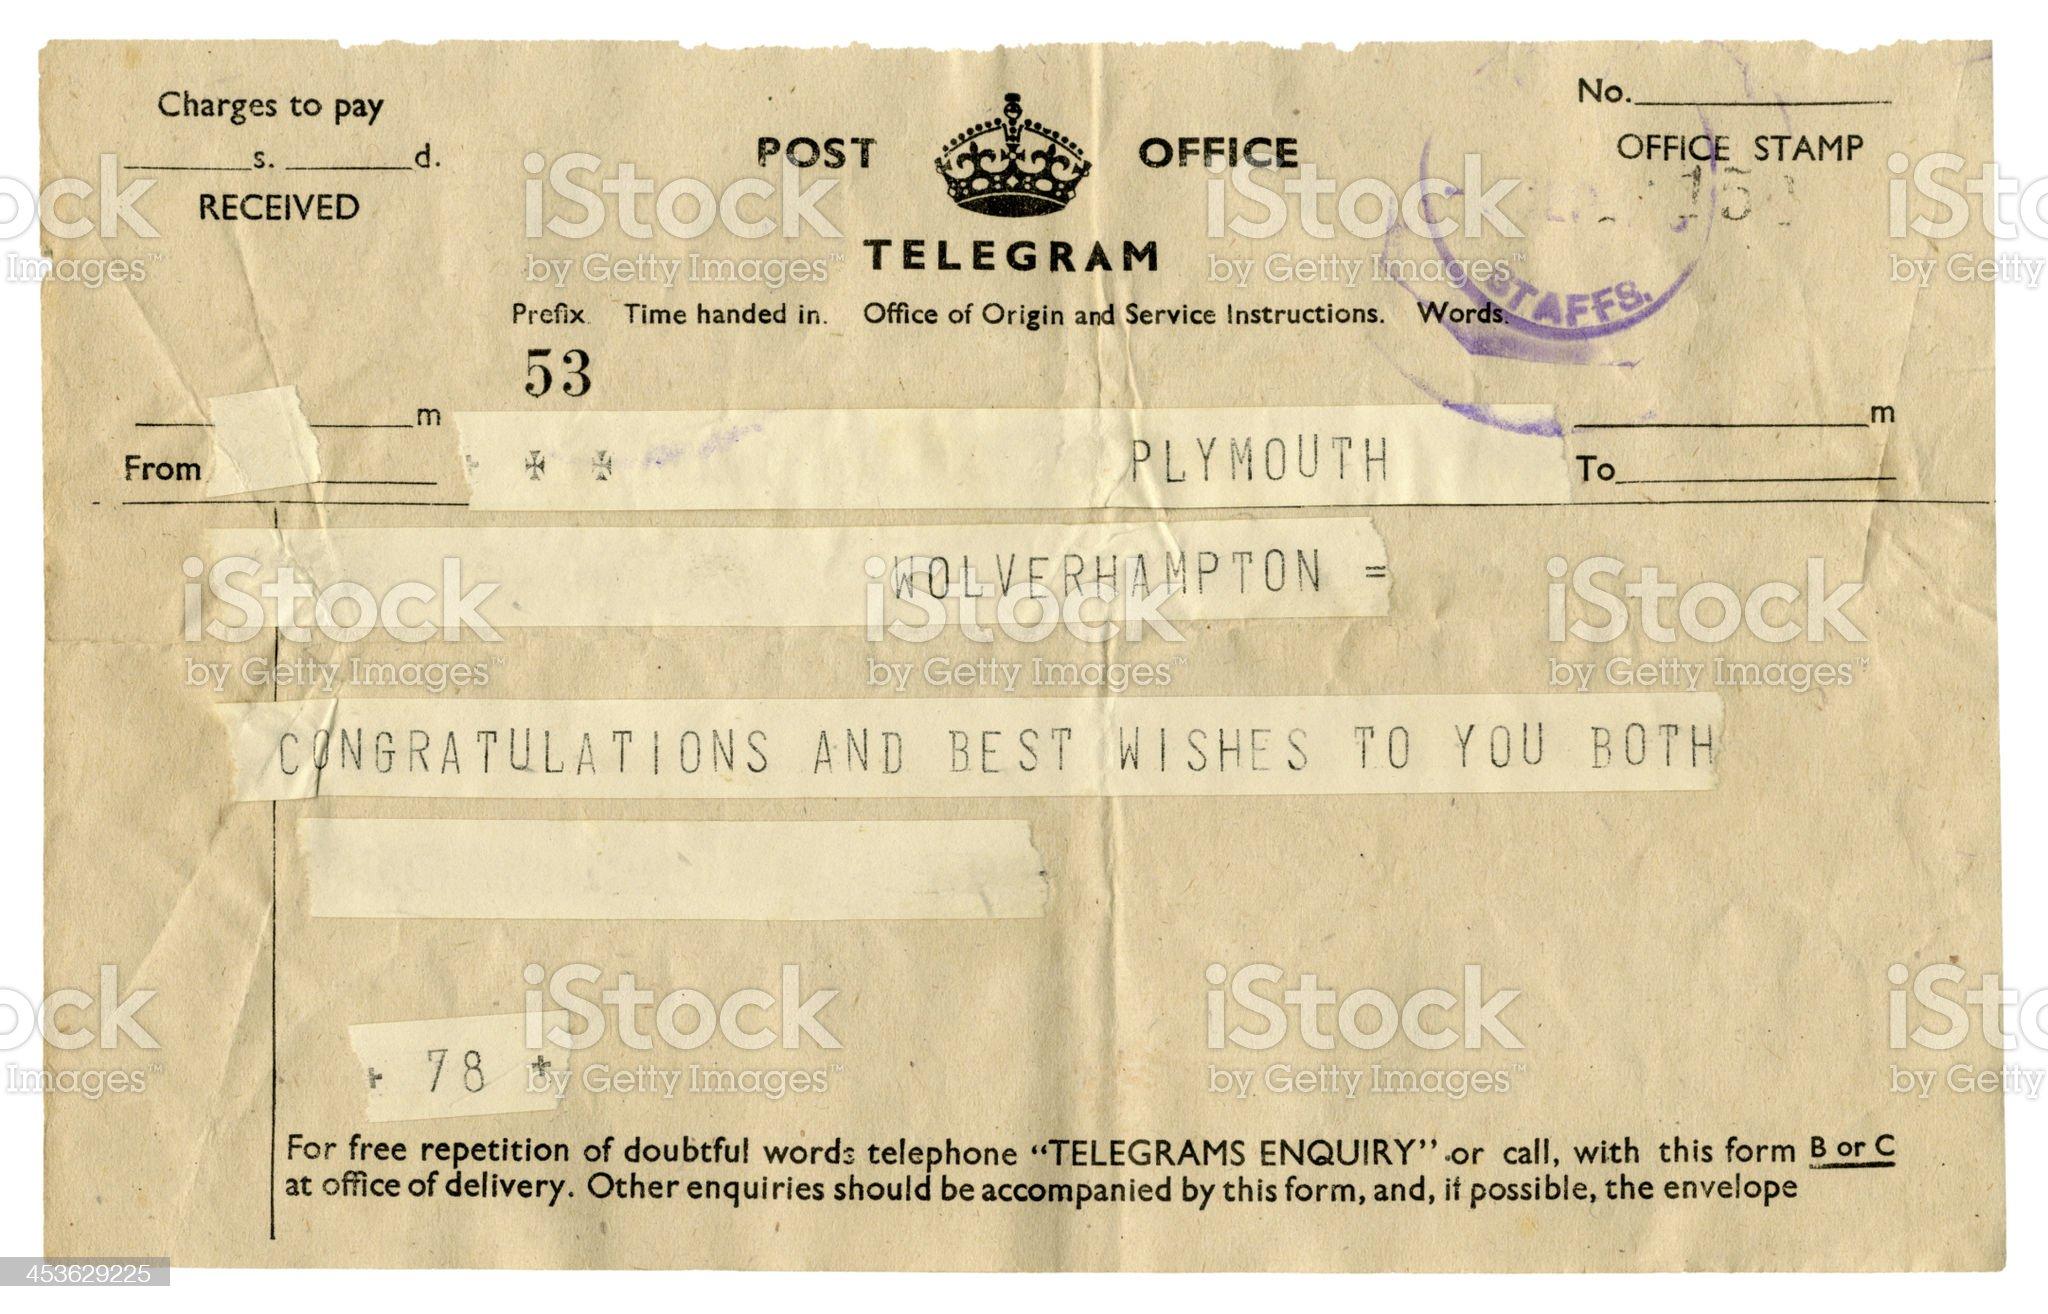 British wedding congratulations telegram, 1945 royalty-free stock photo